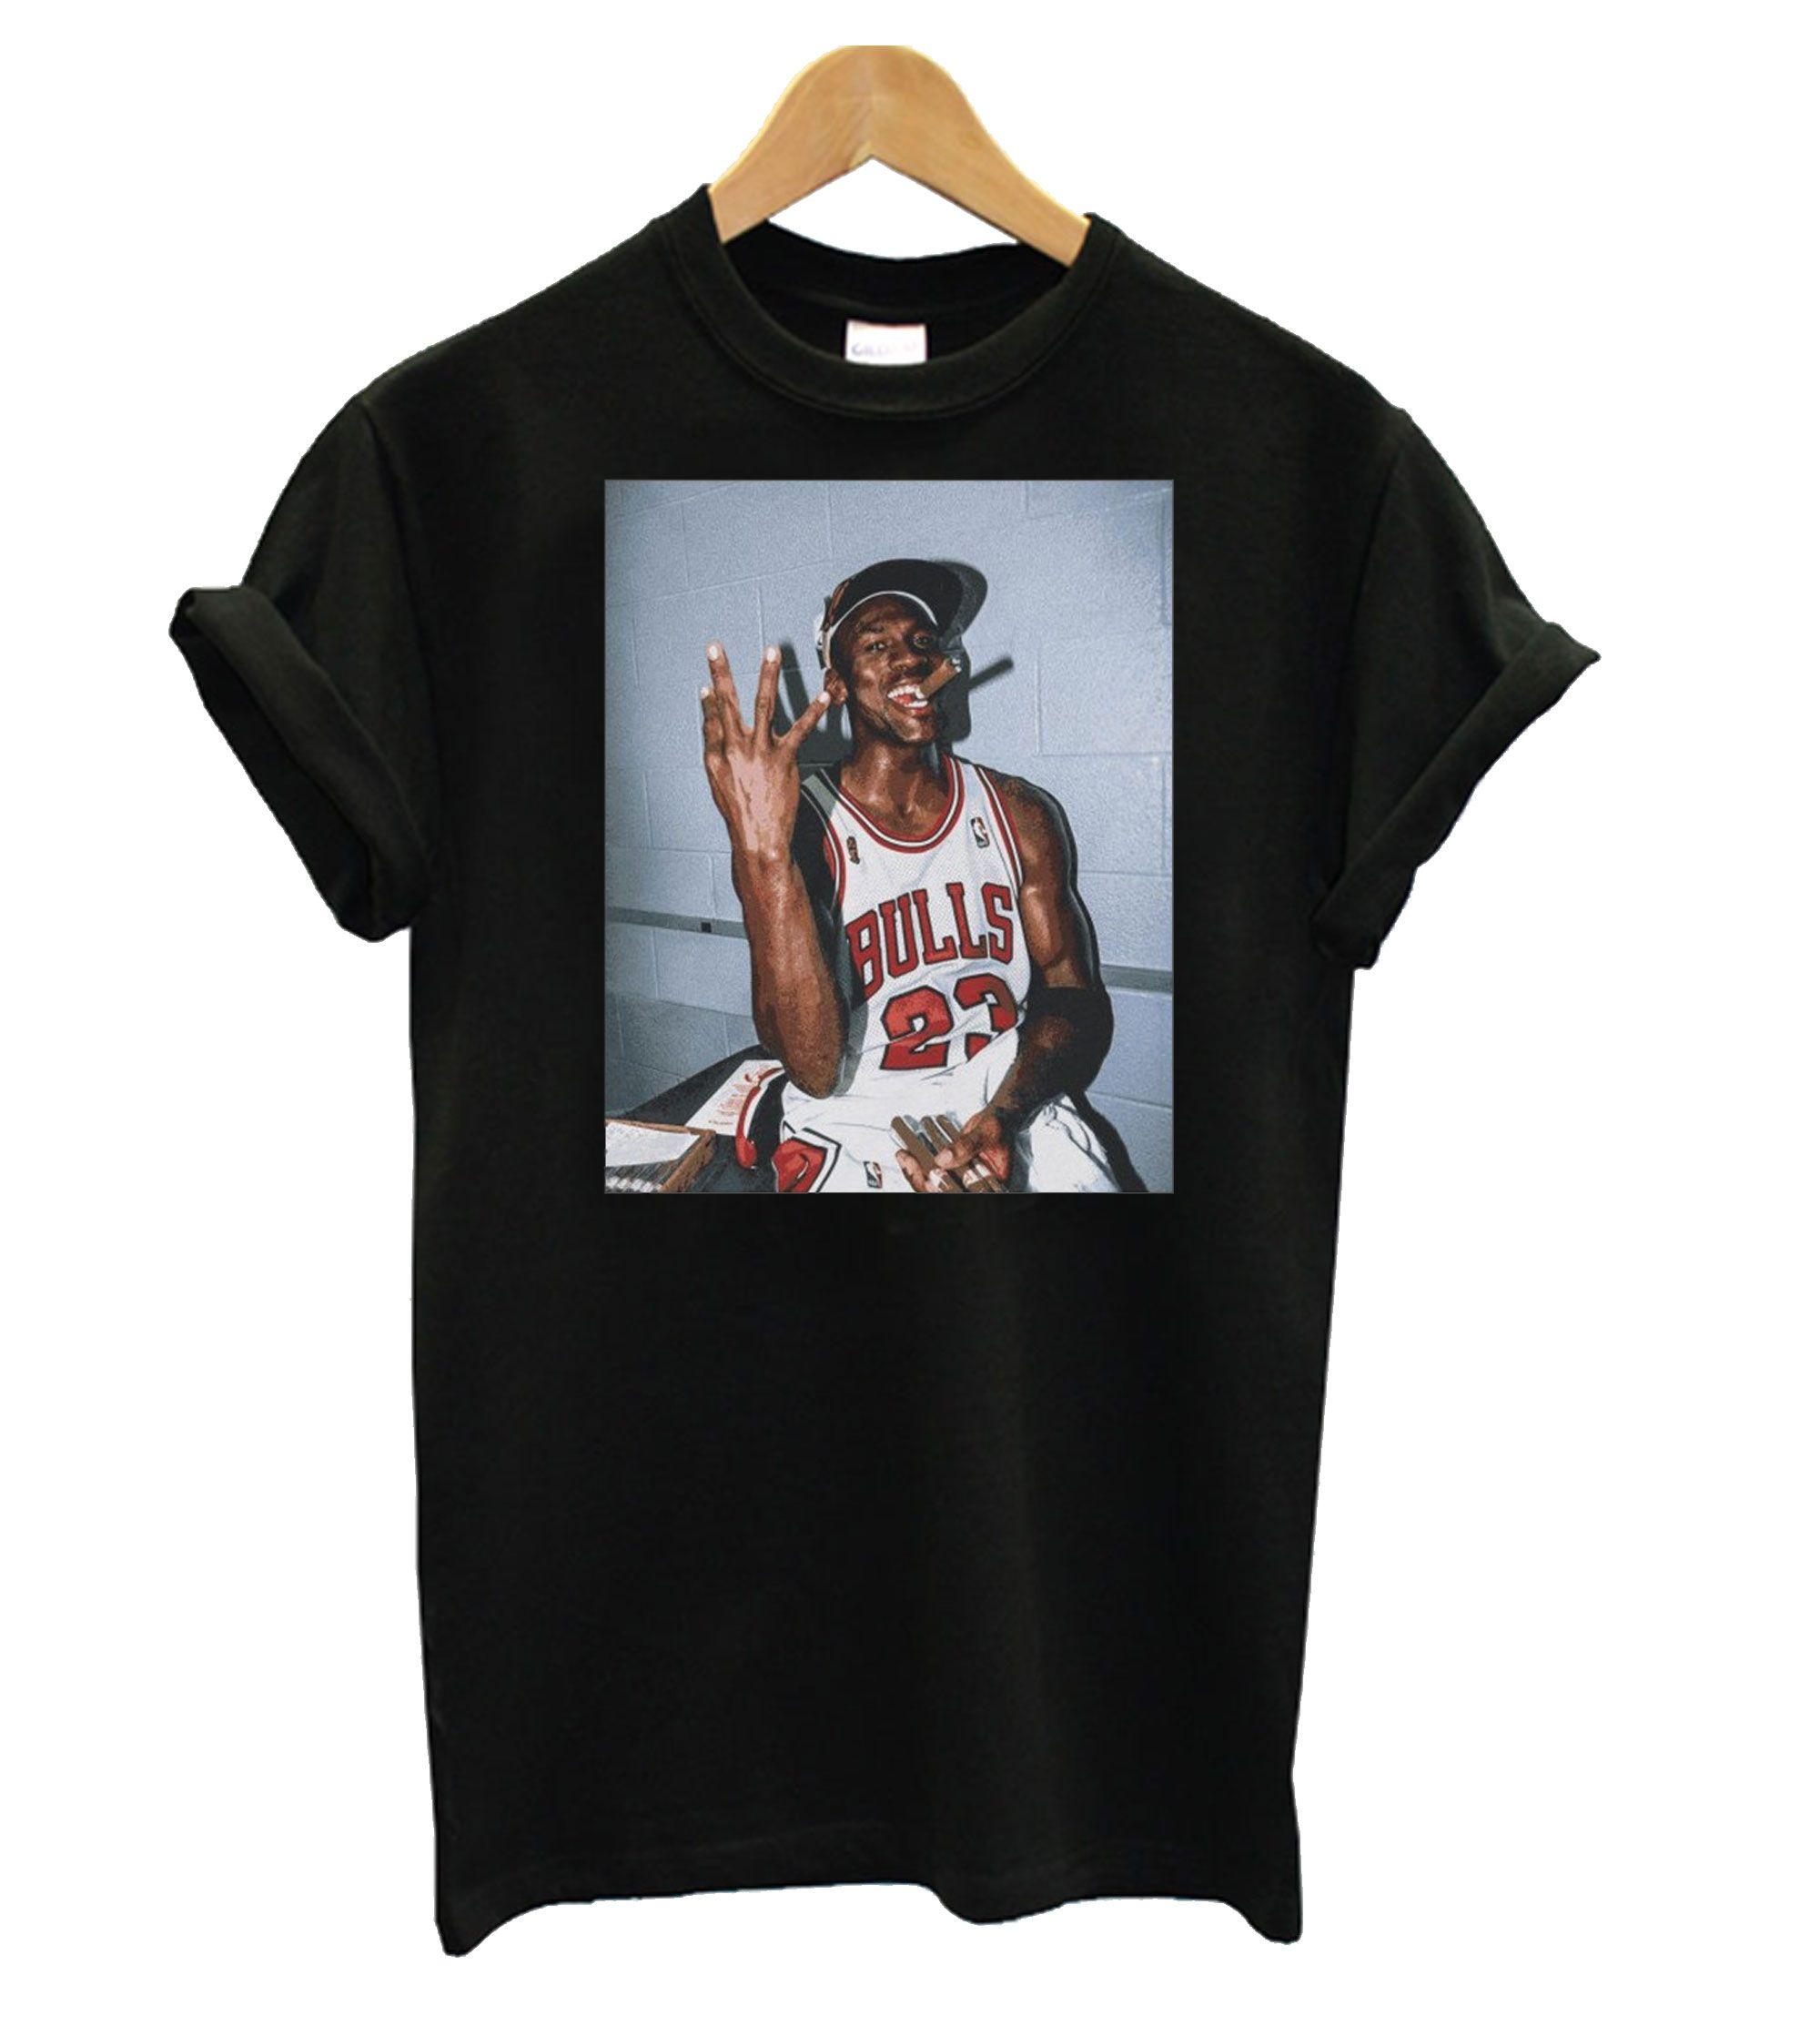 Vintage Michael Jordan Three Peat T Shirt In 2020 Michael Jordan T Shirts Michael Jordan Shirts Michael Jordan